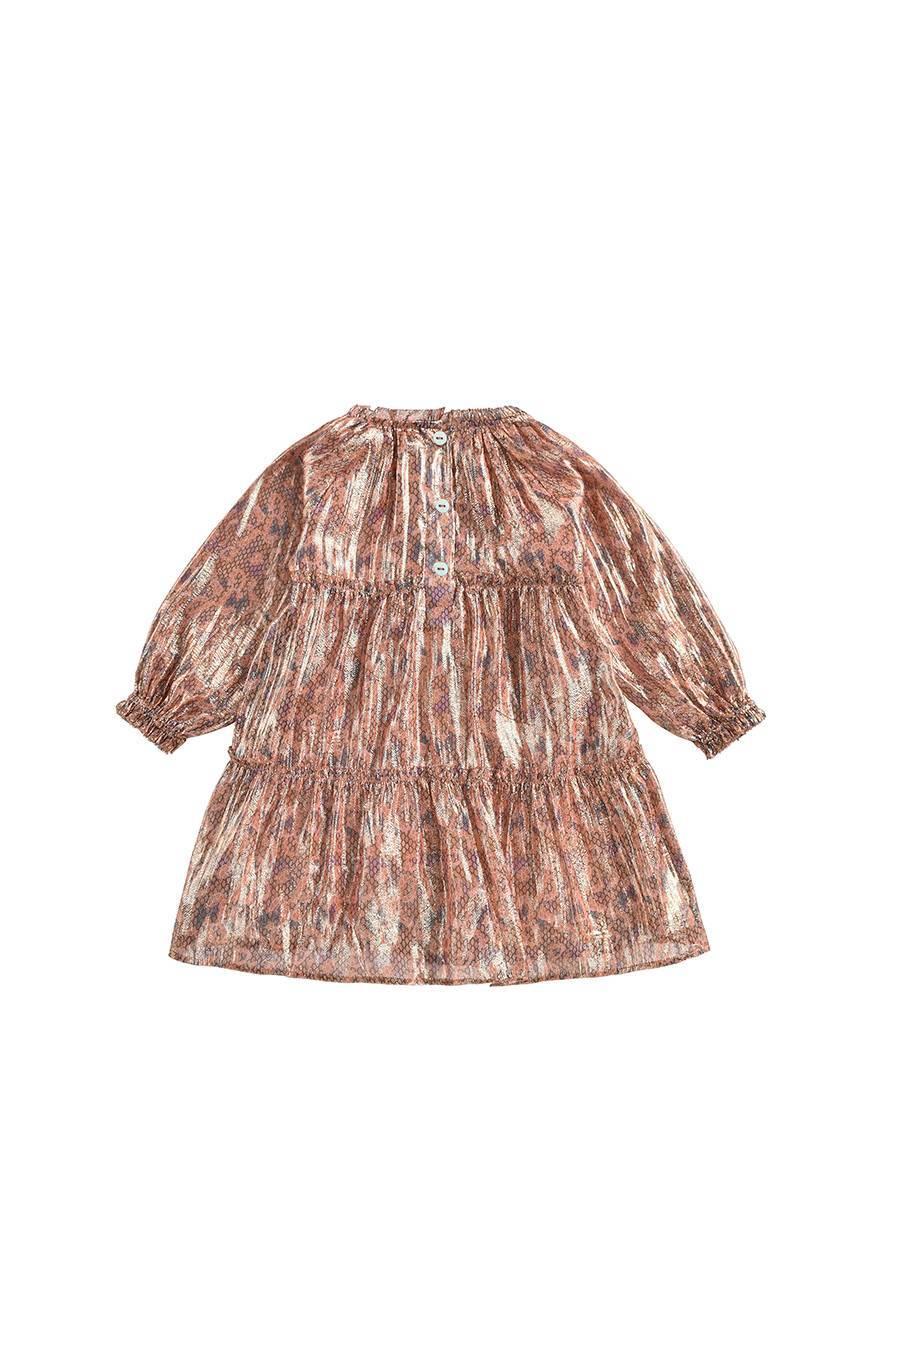 boheme chic vintage robe bébé fille sonia sienna polka dots